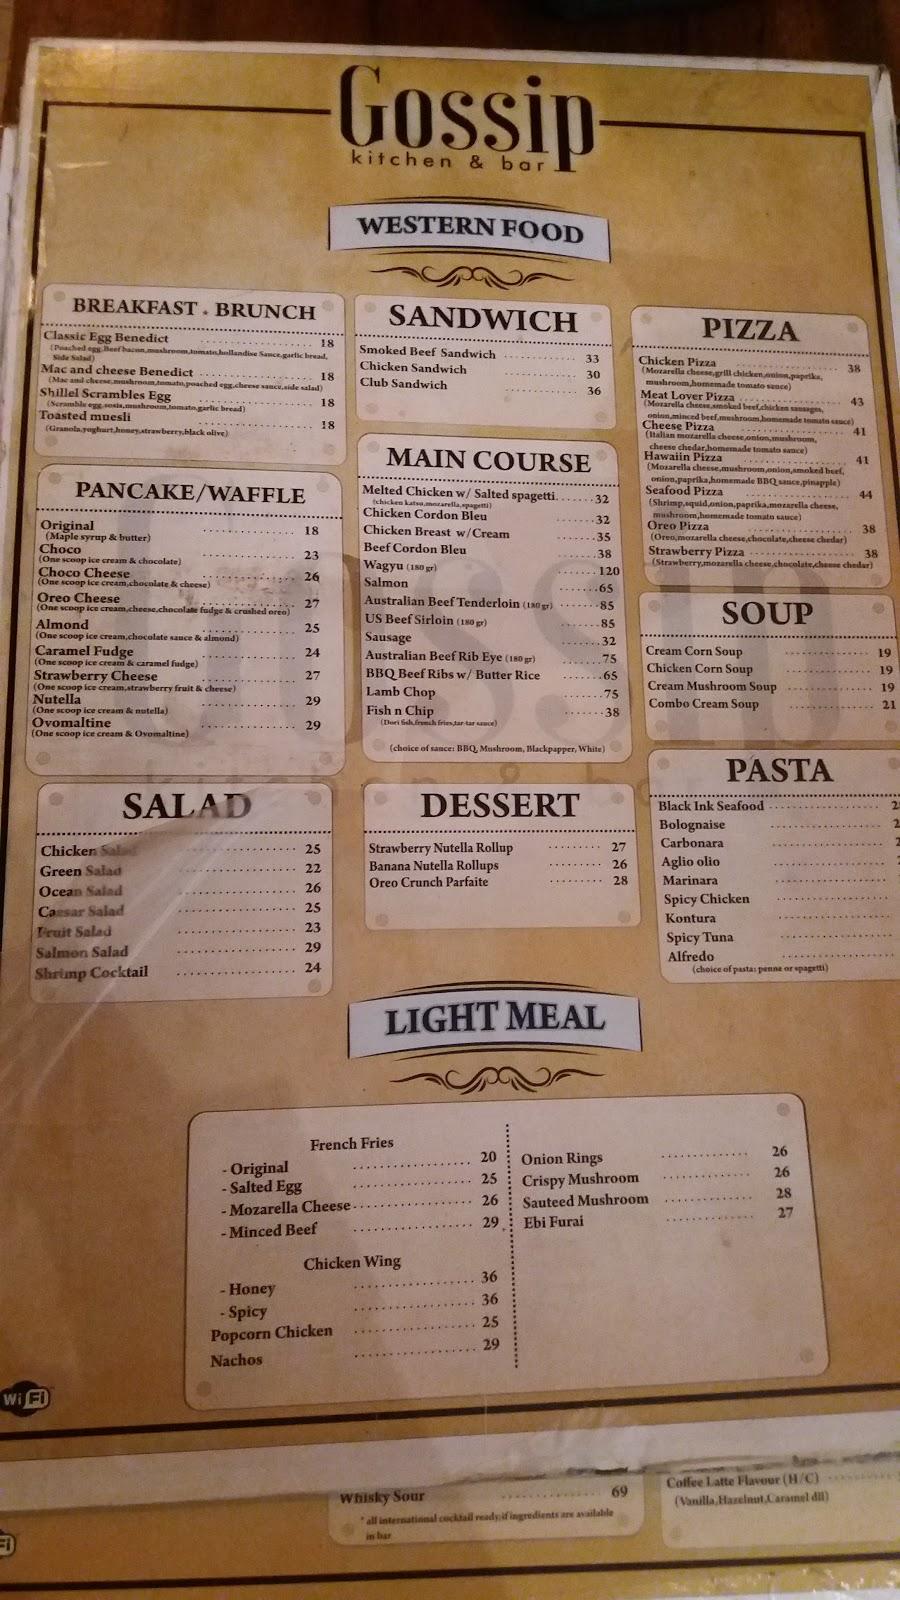 Daftar menu gossip kitchen bar semarang